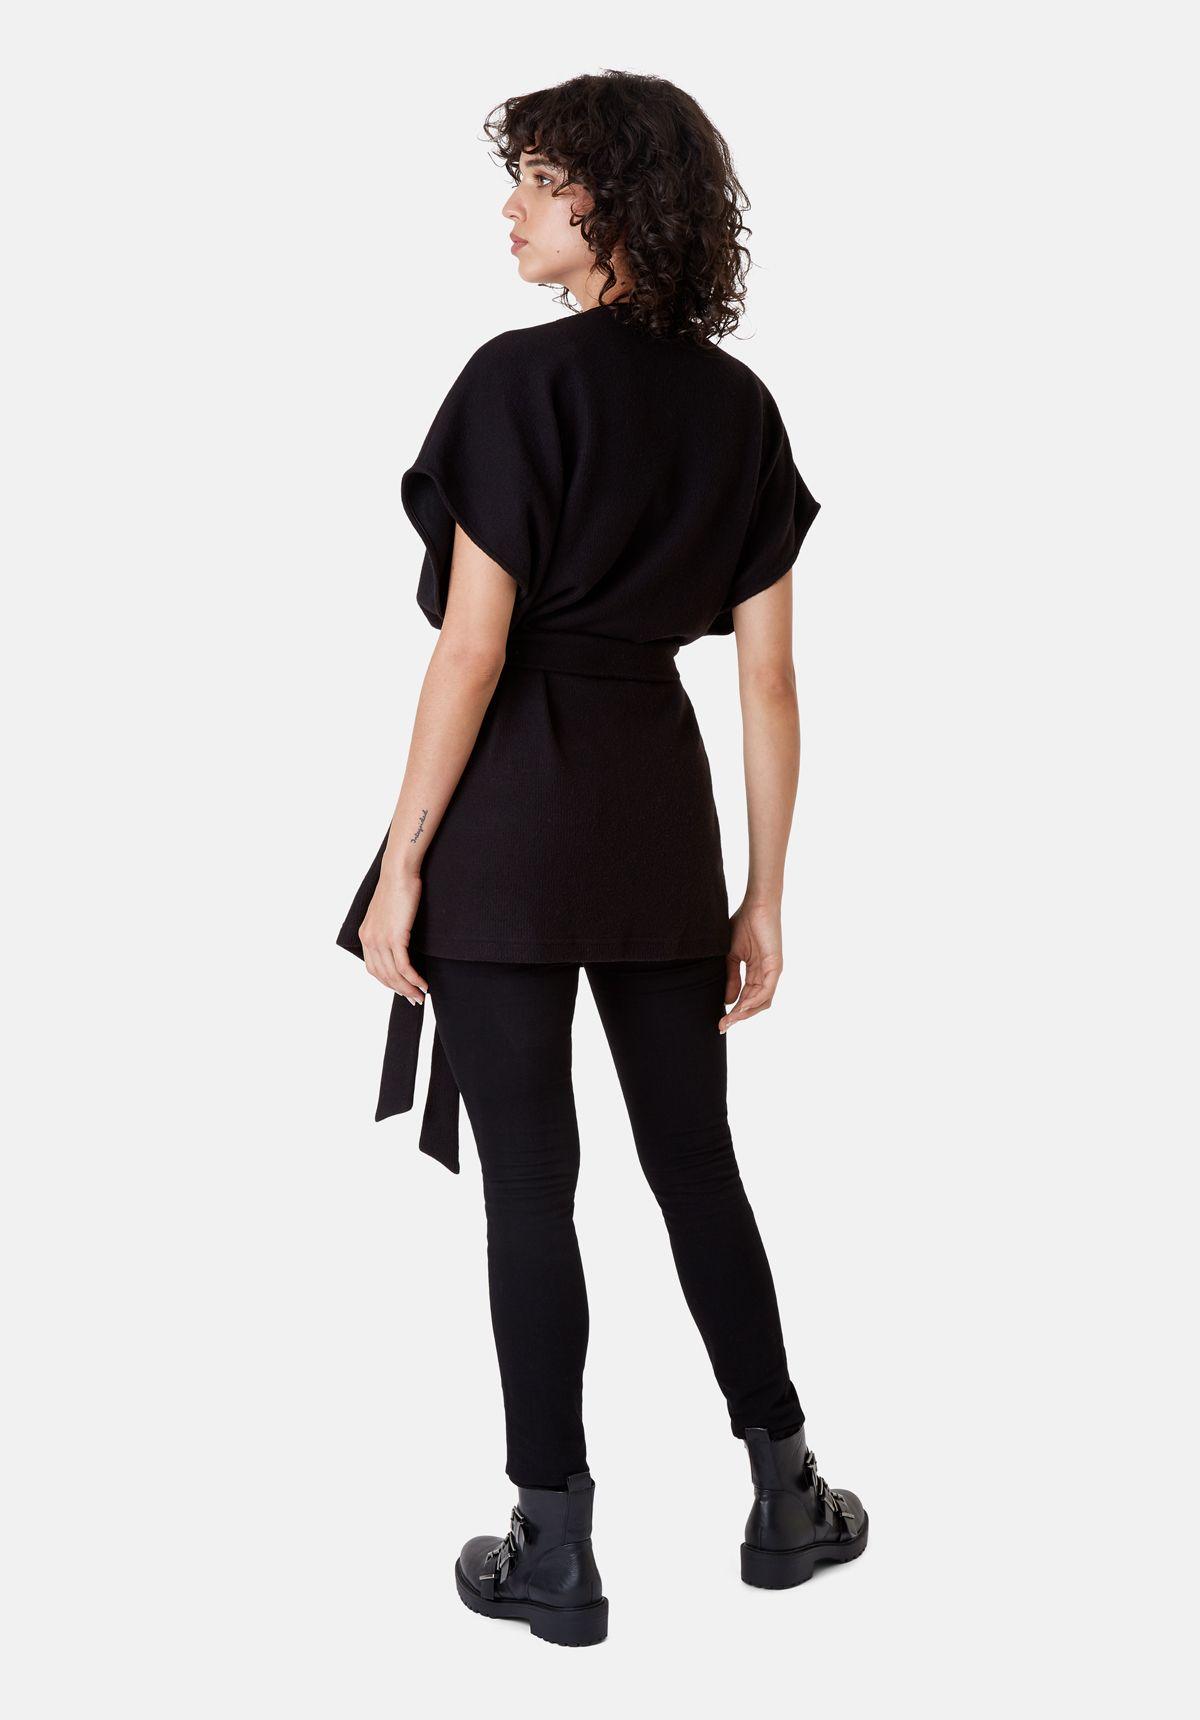 Poncho Sleeveless Wrap Cardigan in Black